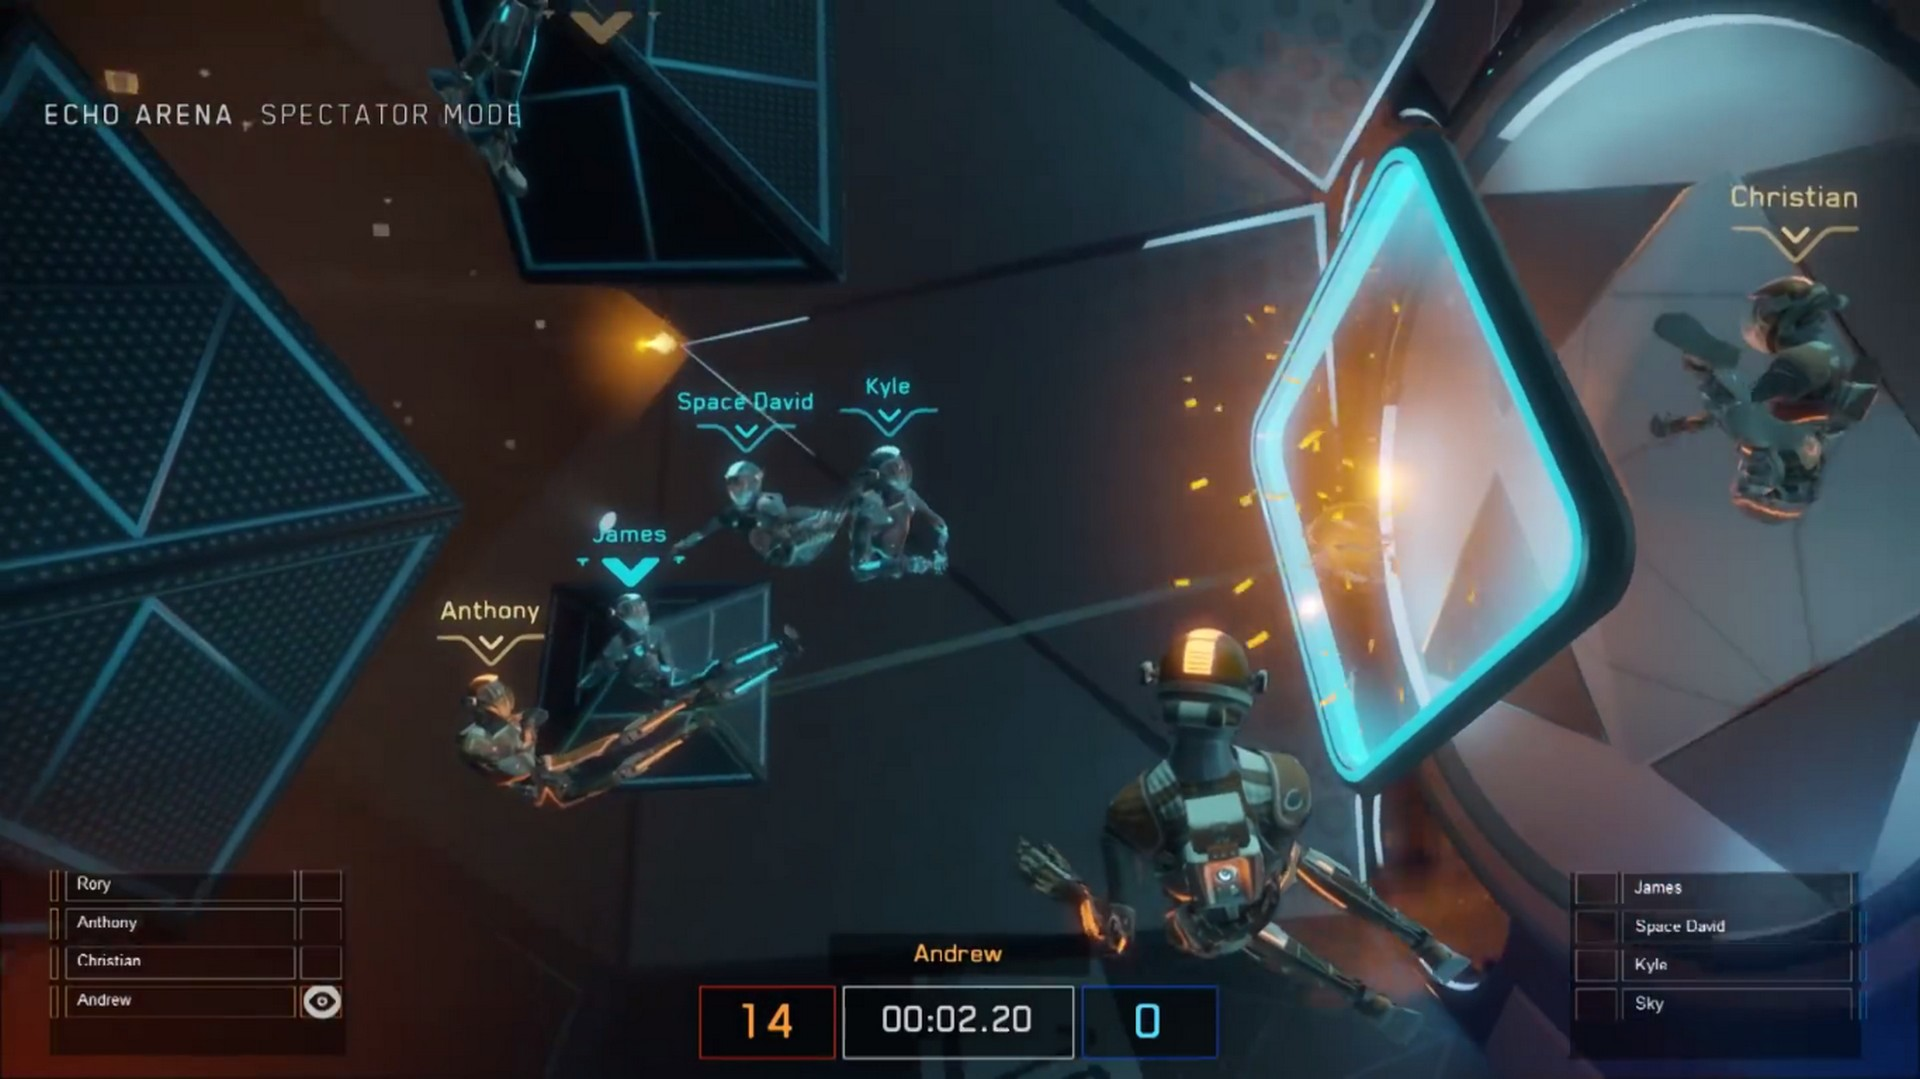 lone-echo-trailer-per-modalita-multiplayer-gamesoul